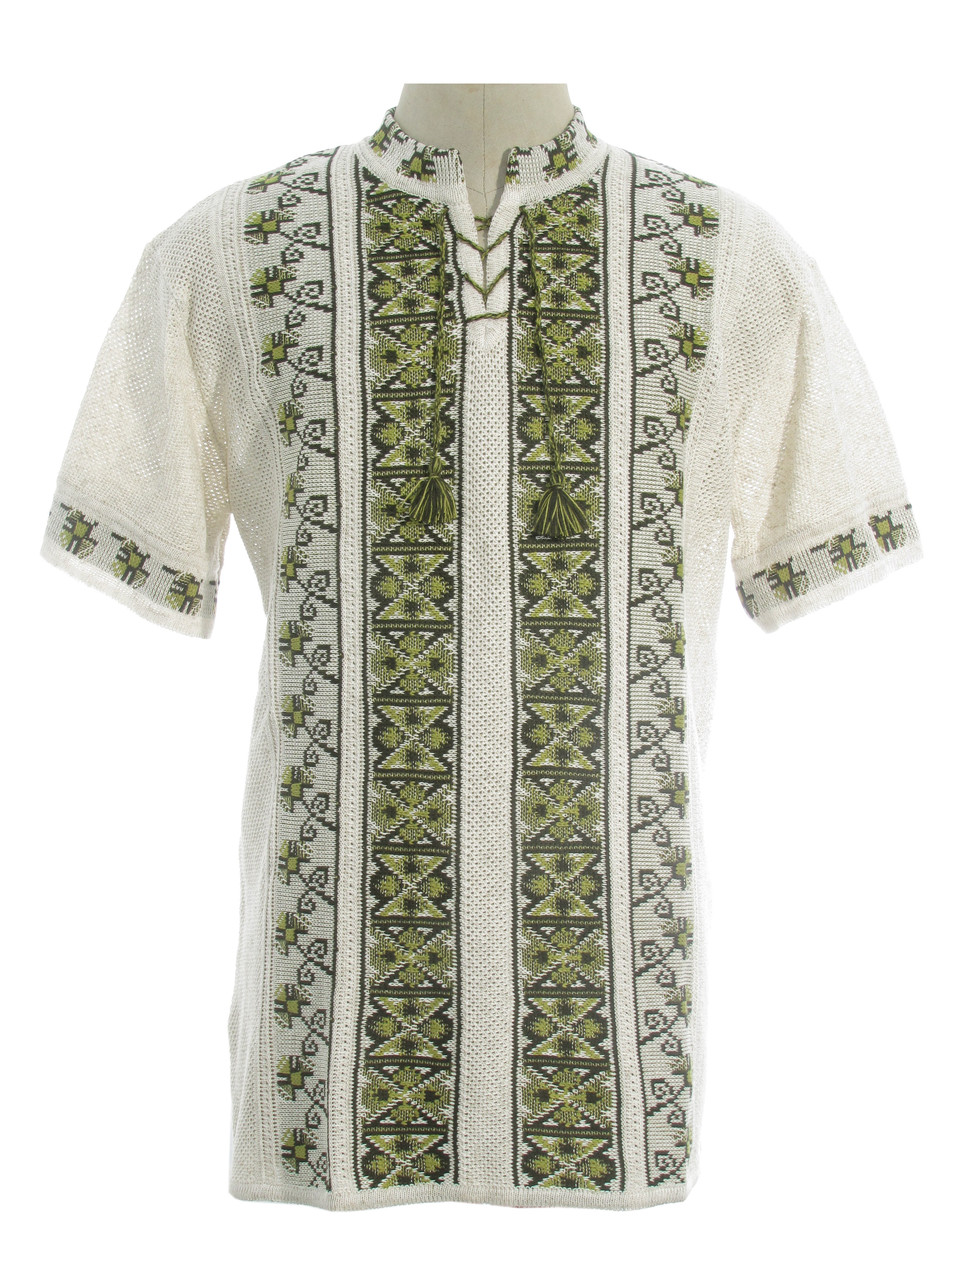 Мужская вязаная рубашка 20281 (короткий рукав)